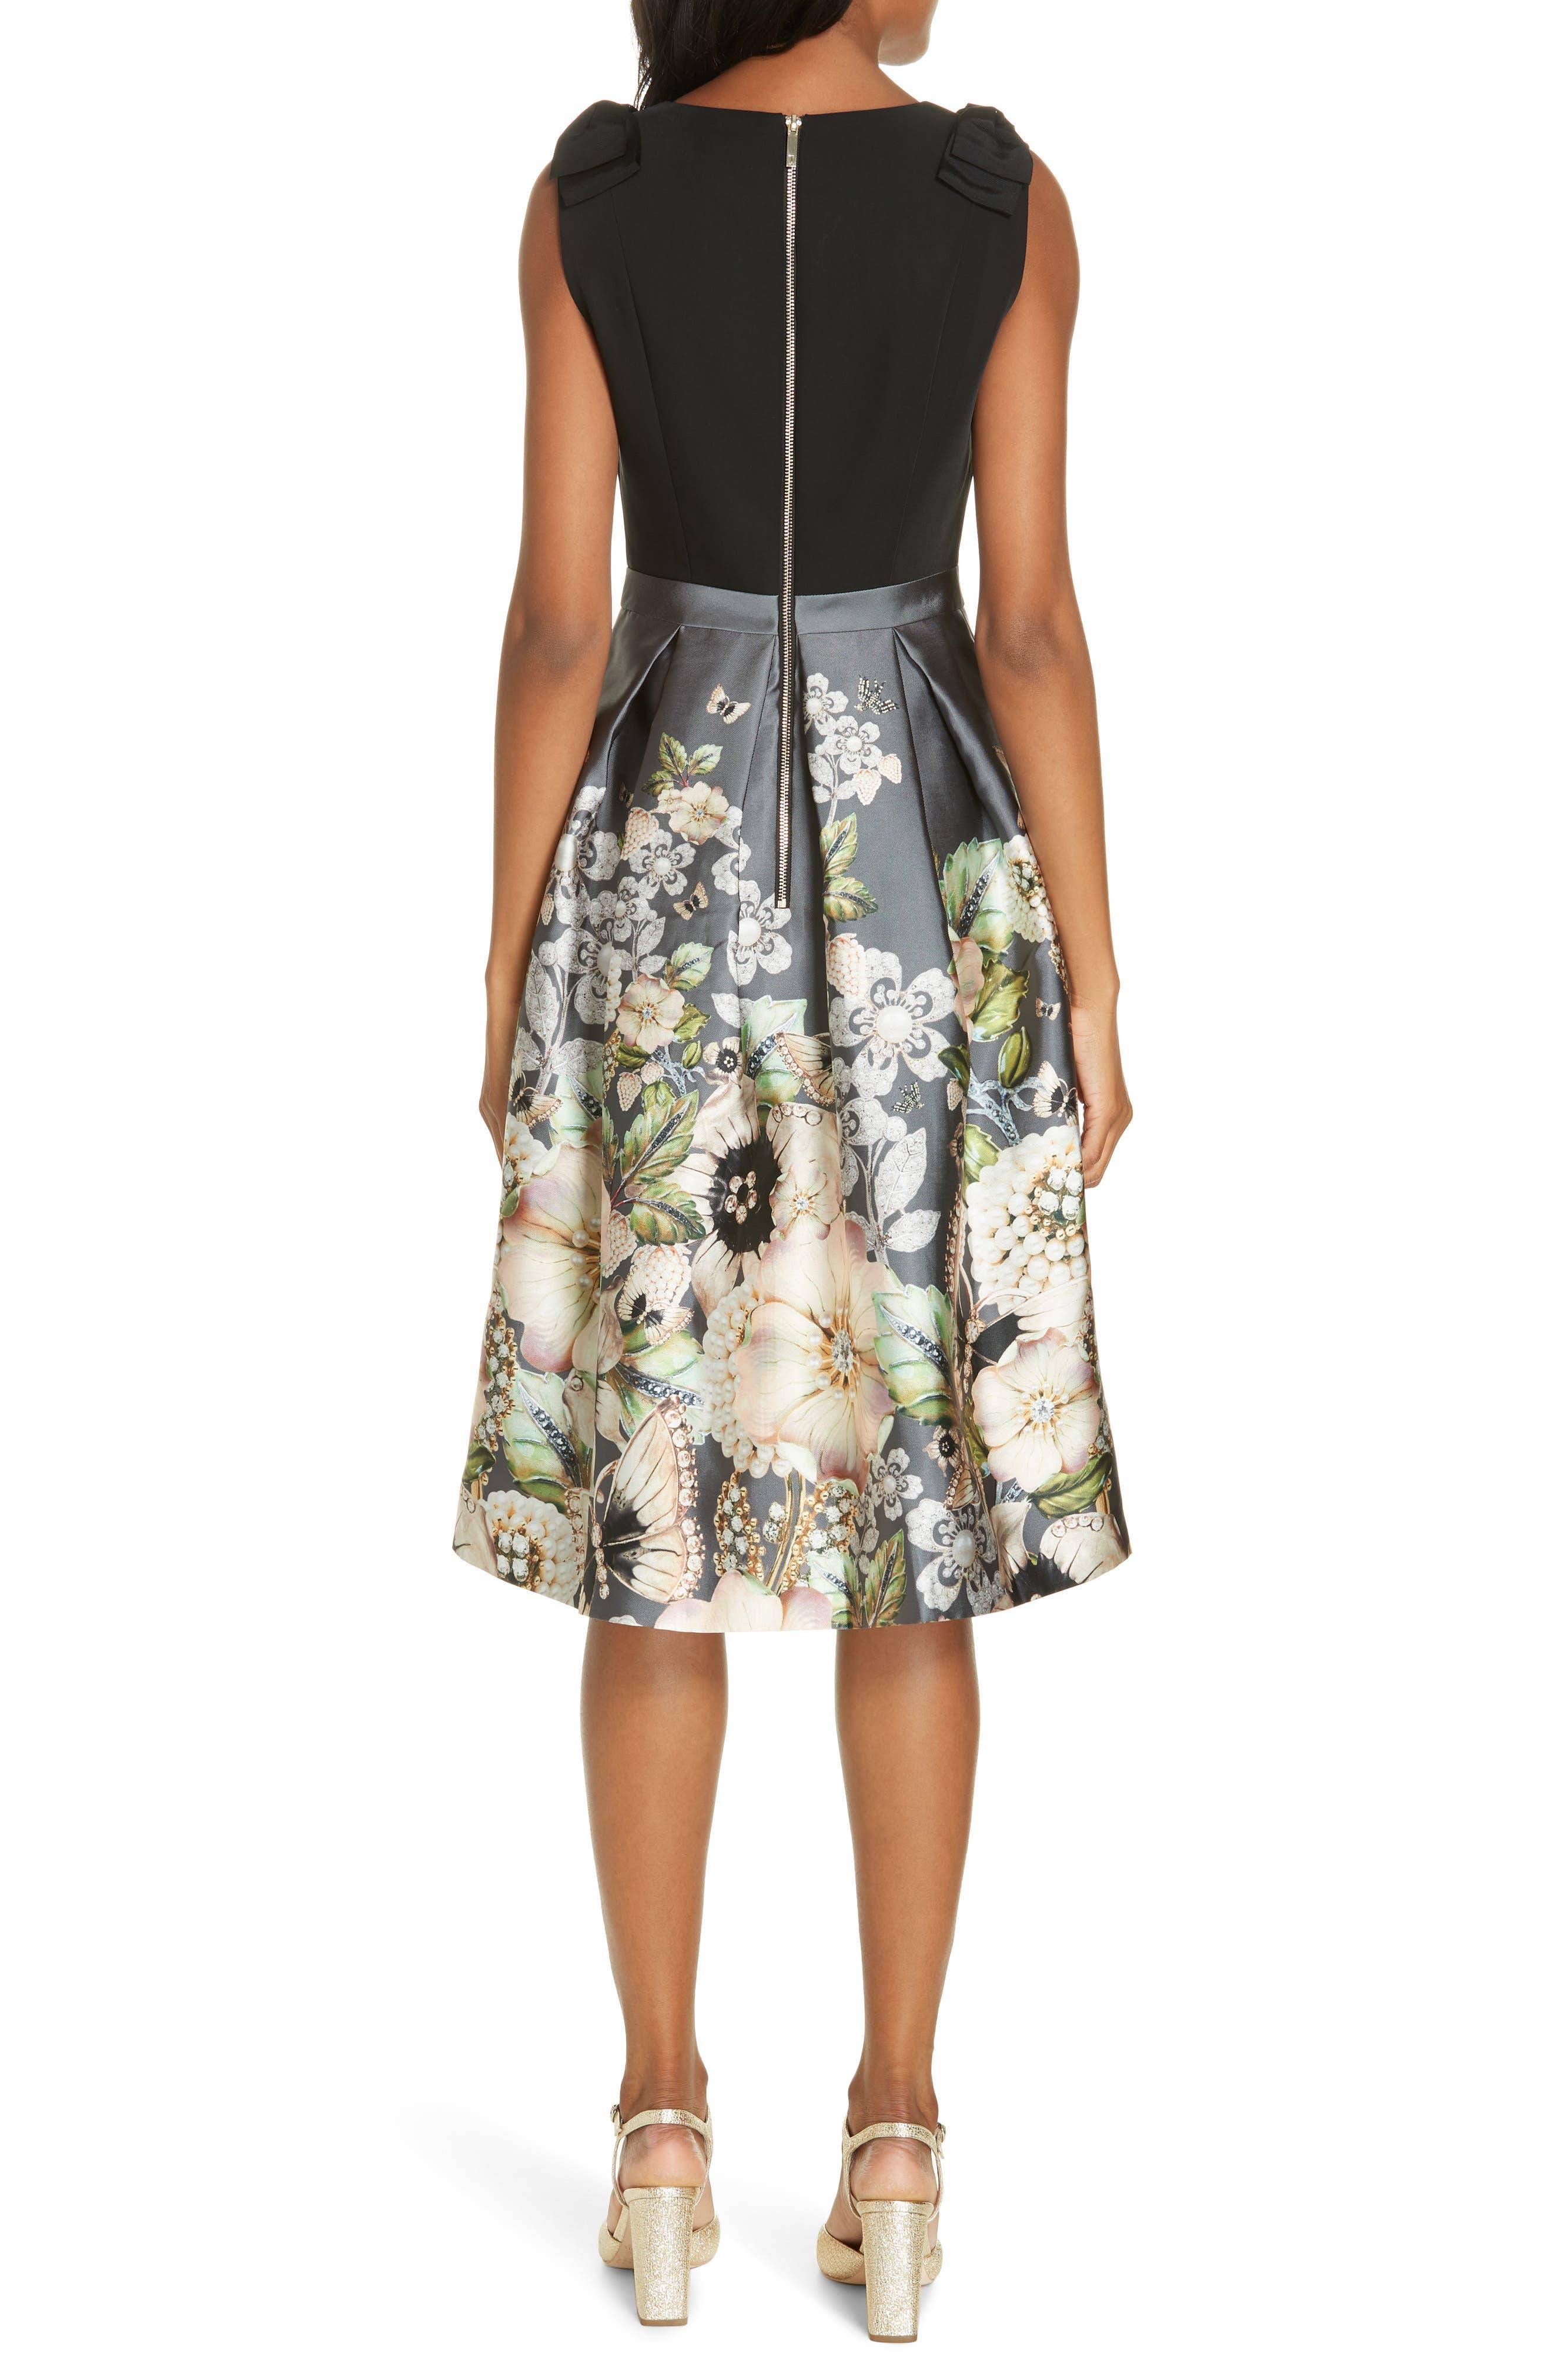 Molyka Gem Gardens Bow Dress,                             Alternate thumbnail 2, color,                             CHARCOAL